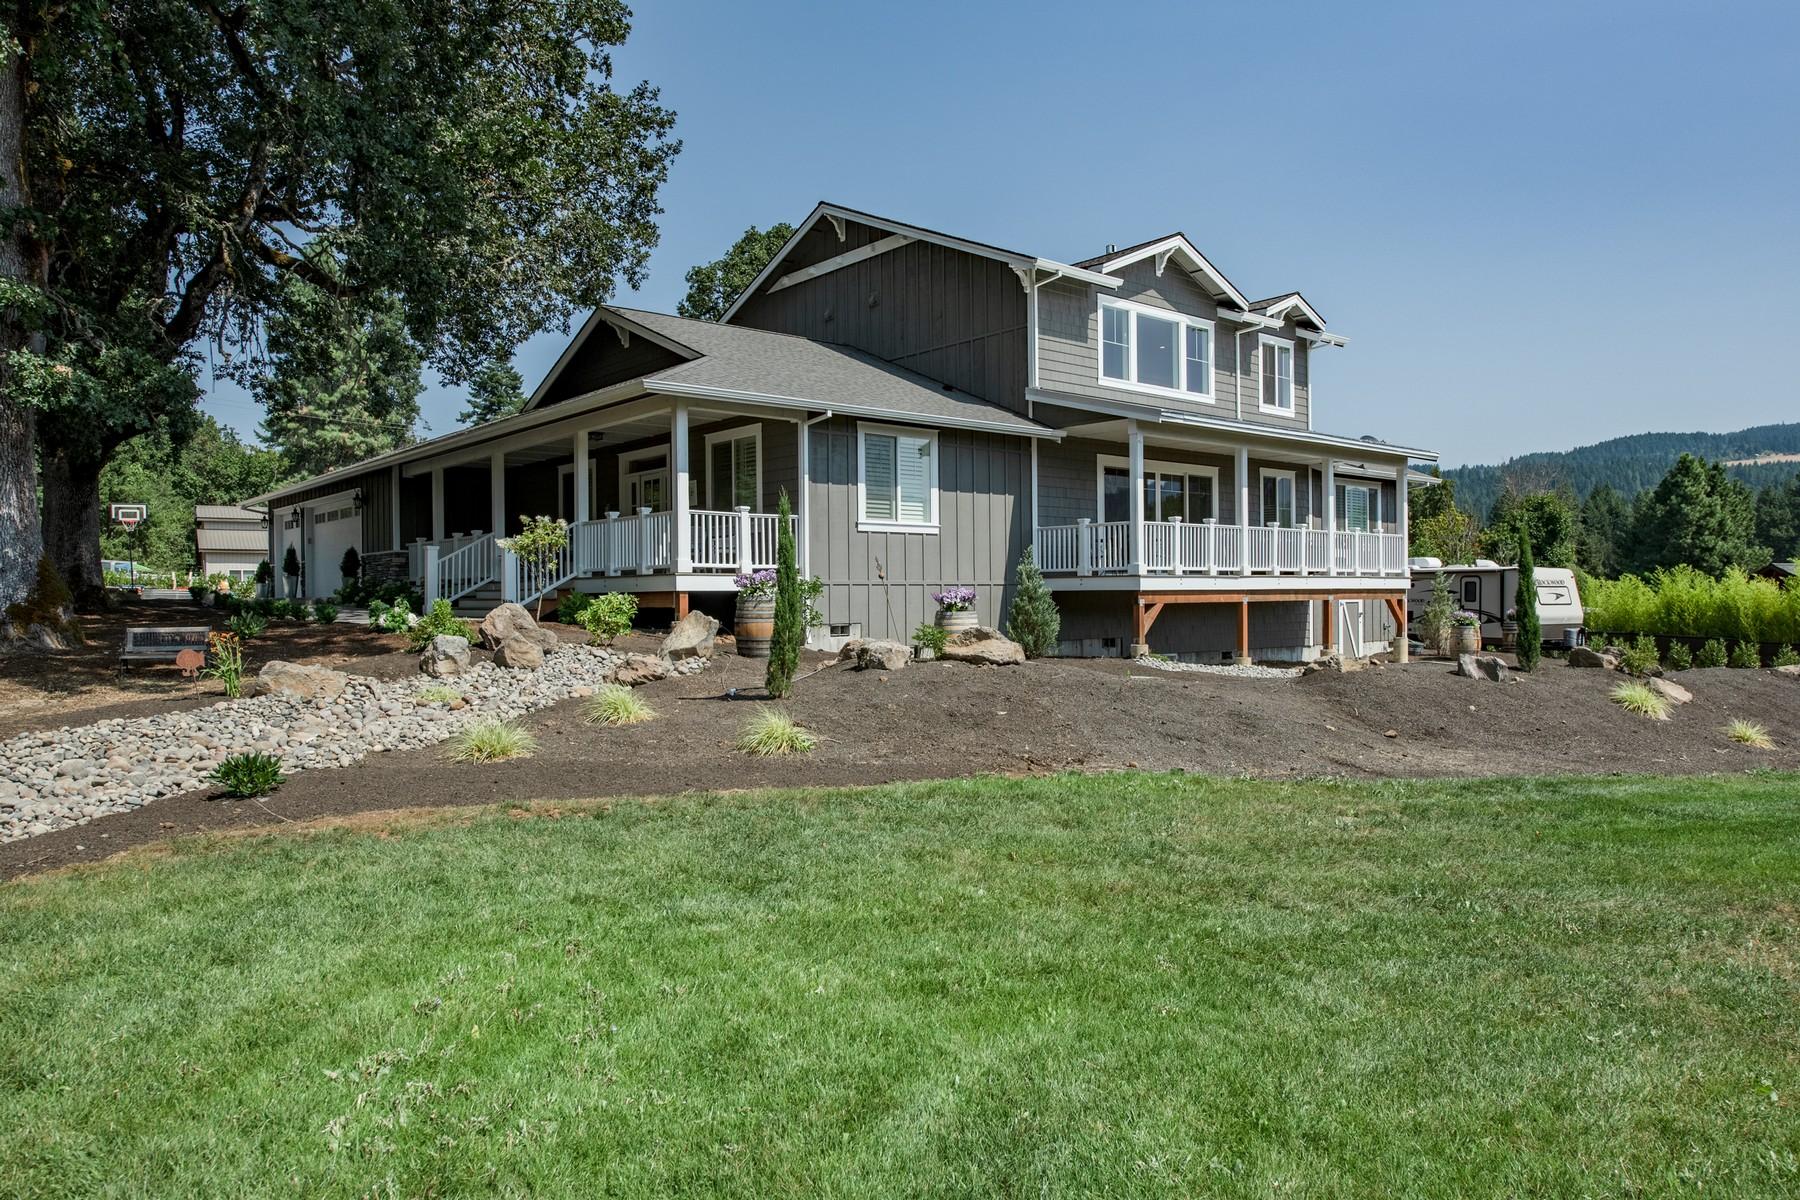 Single Family Homes for Sale at Custom Farmhouse 25 Longhorn LN White Salmon, Washington 98672 United States